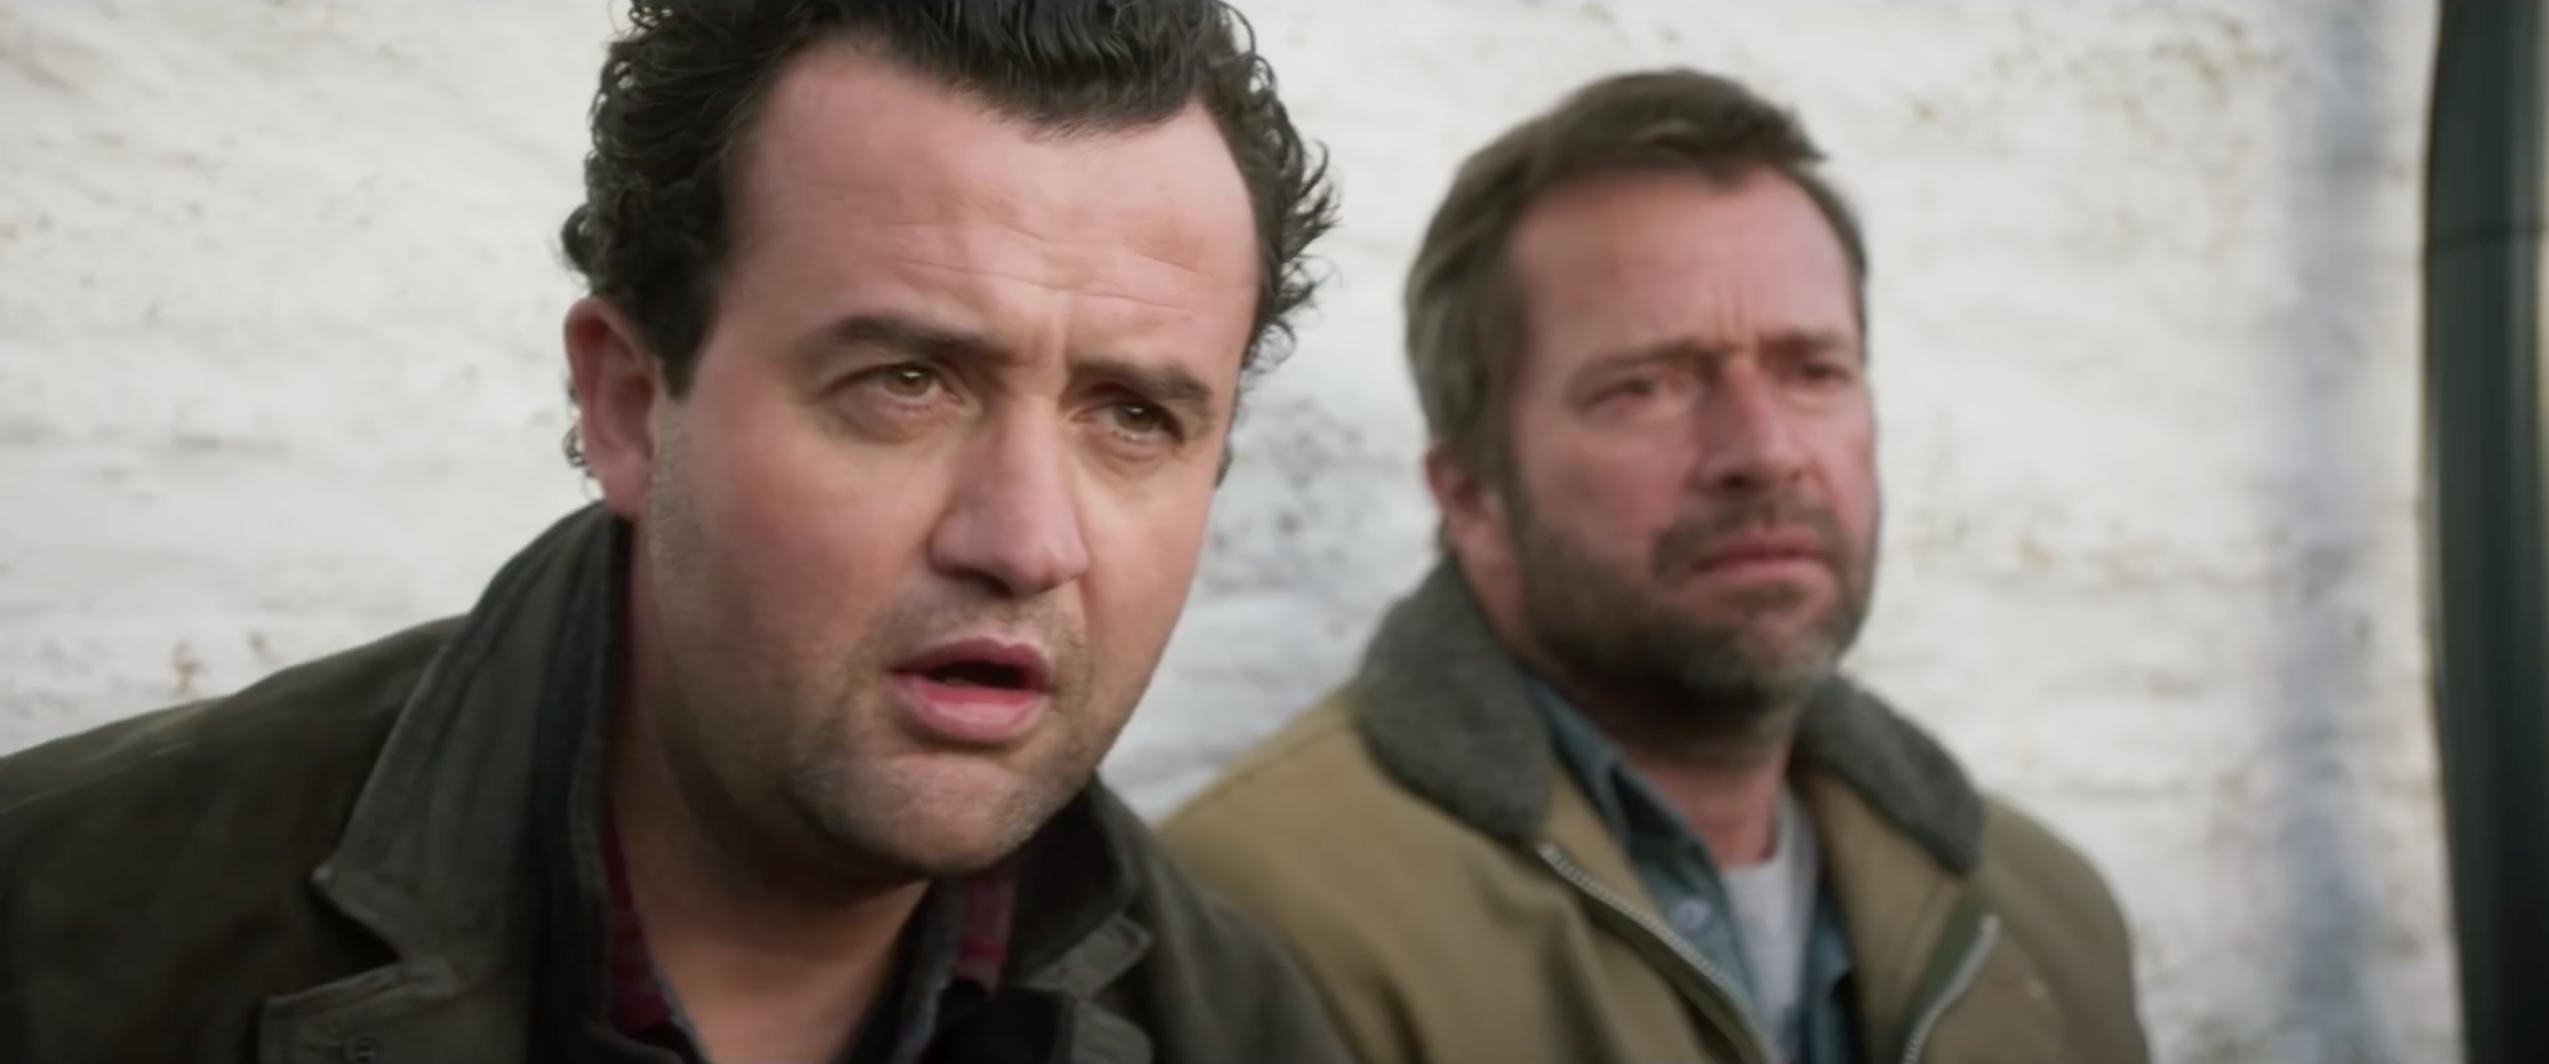 James Purefoy and Daniel Mays in Fisherman's Friends (2019)